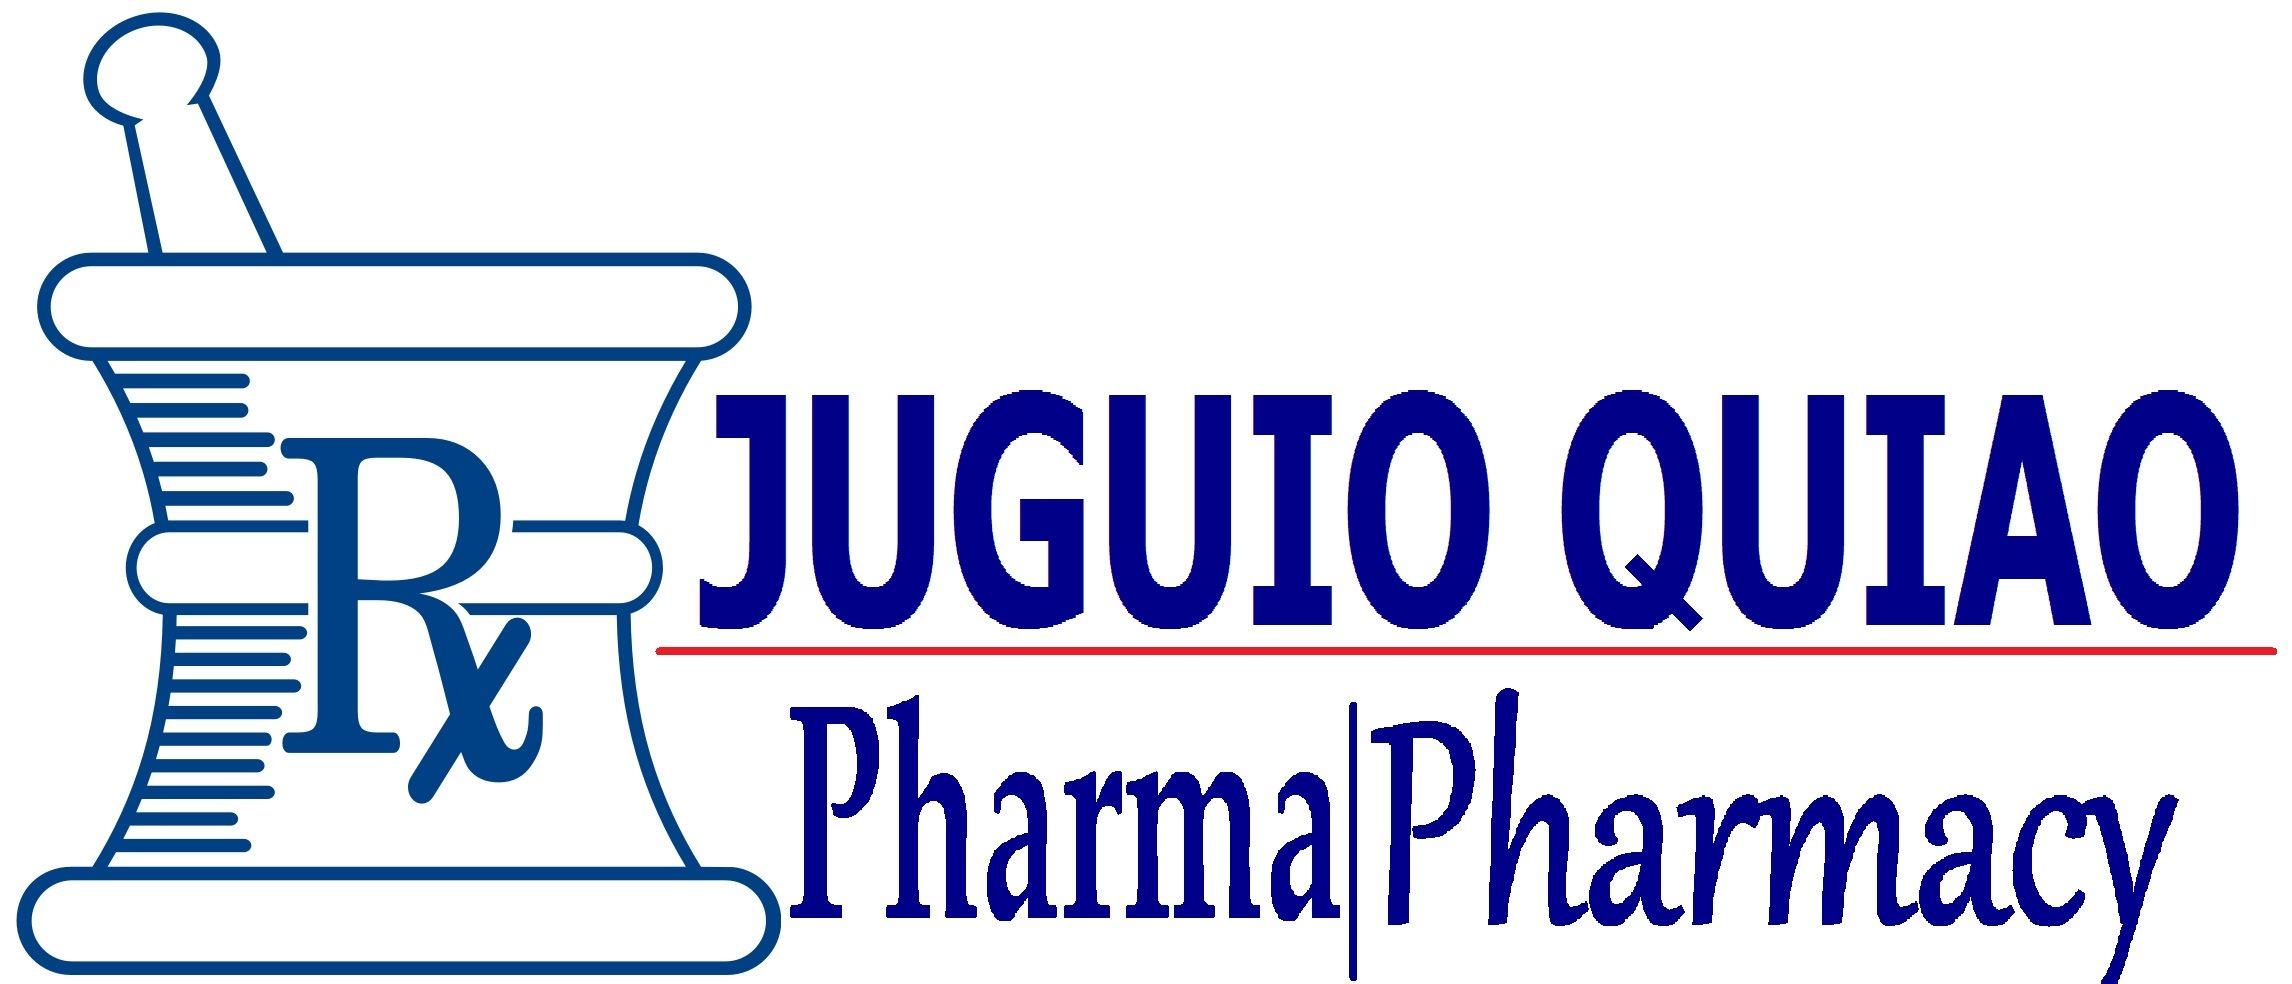 JUGUIO QUIAO PHARMA TRADING/ PHARMACY